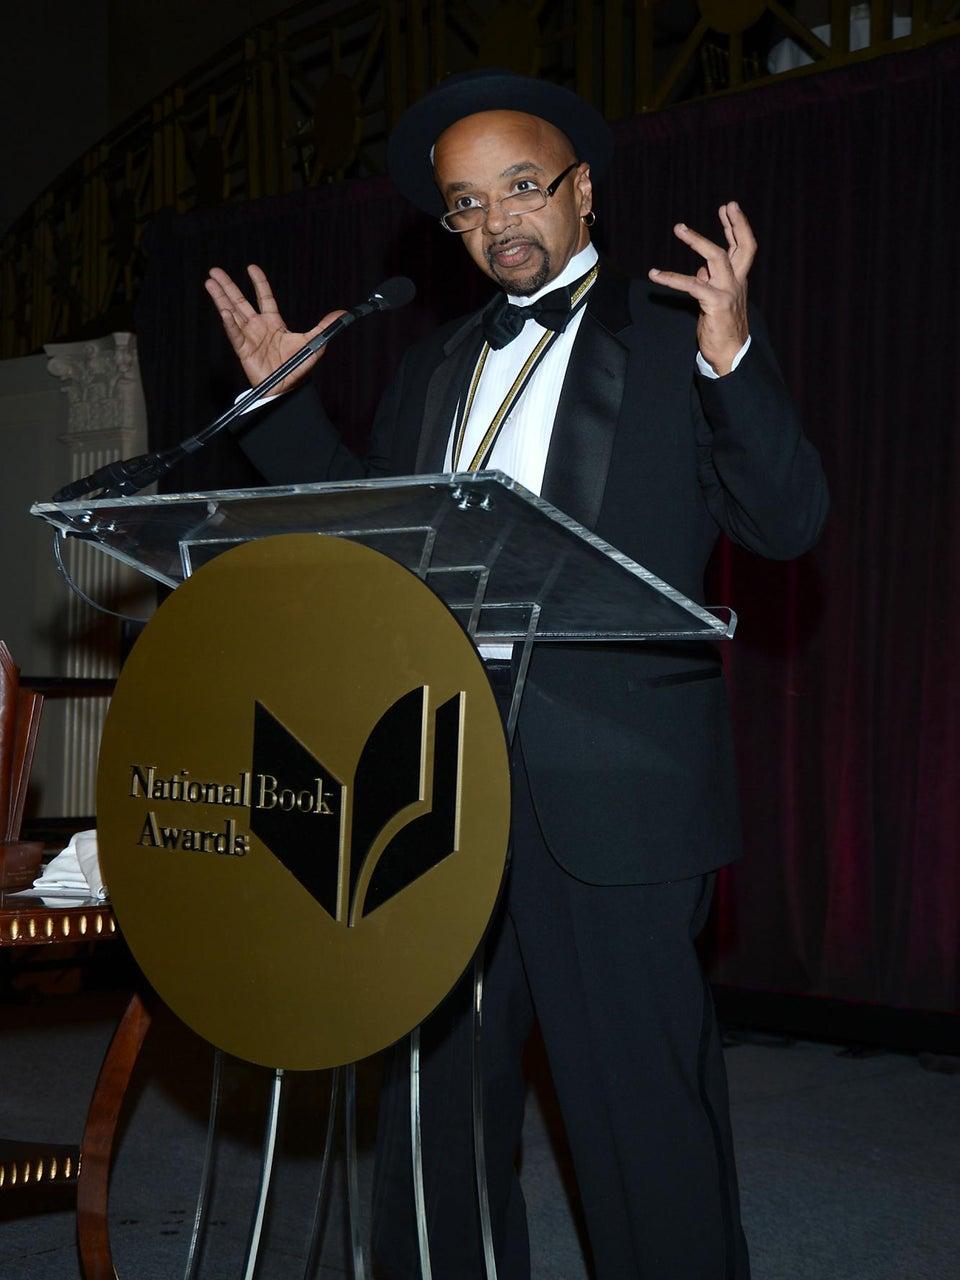 James McBride Wins the National Book Award for Fiction